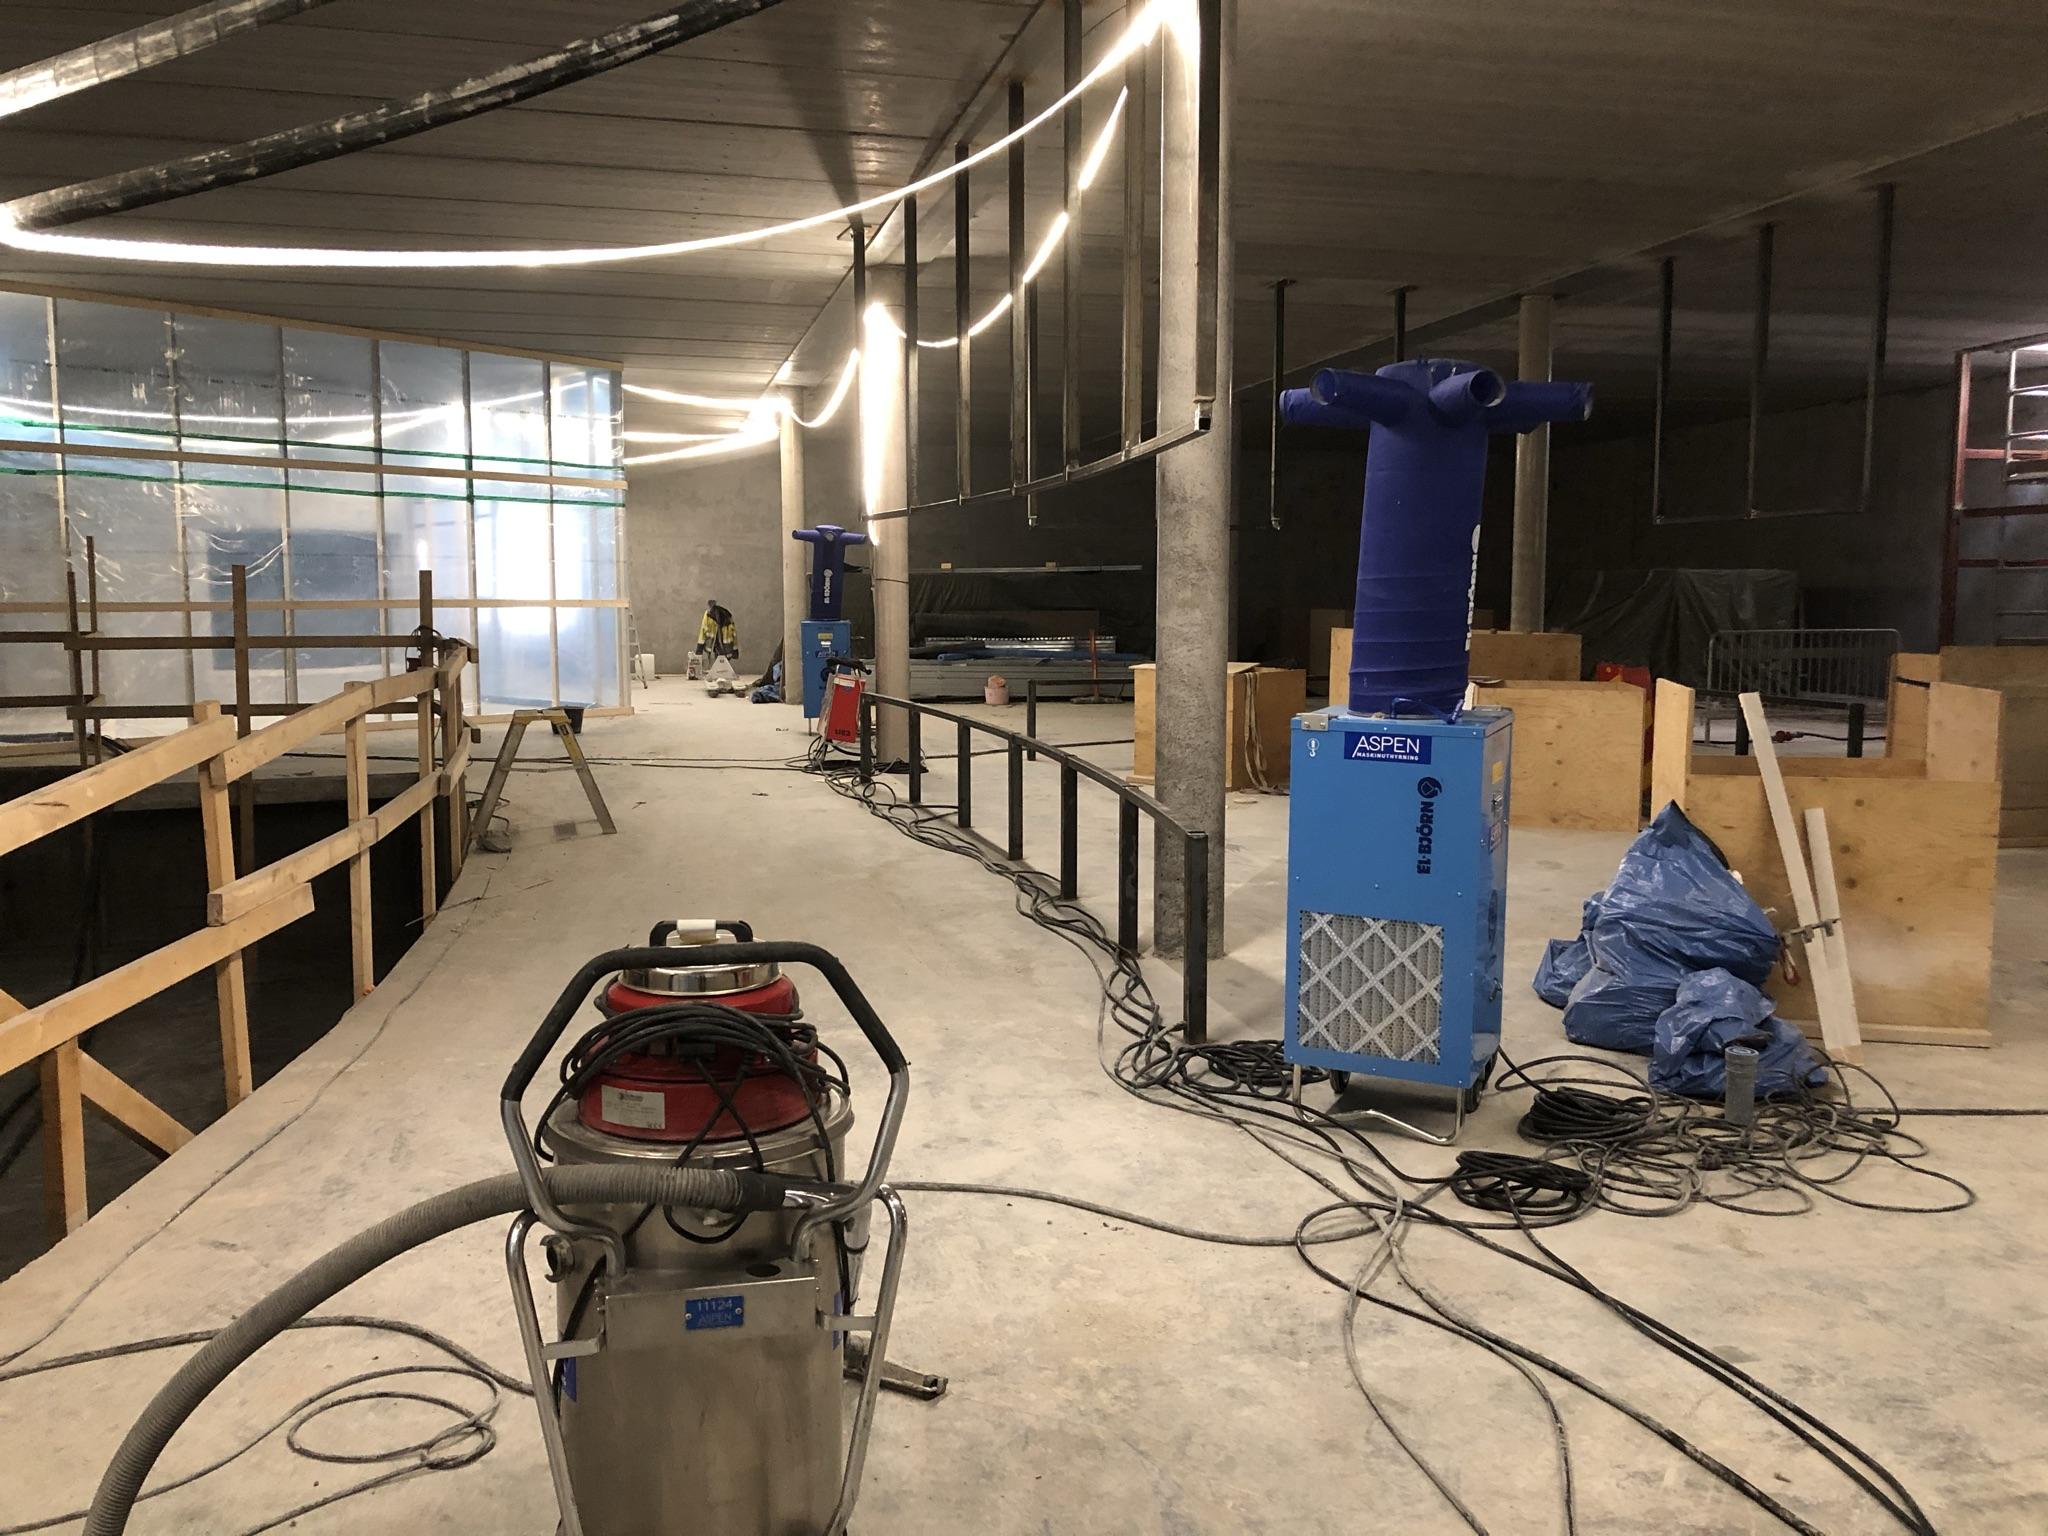 Byggarbetsplats inne i Sjöfartsmuseet